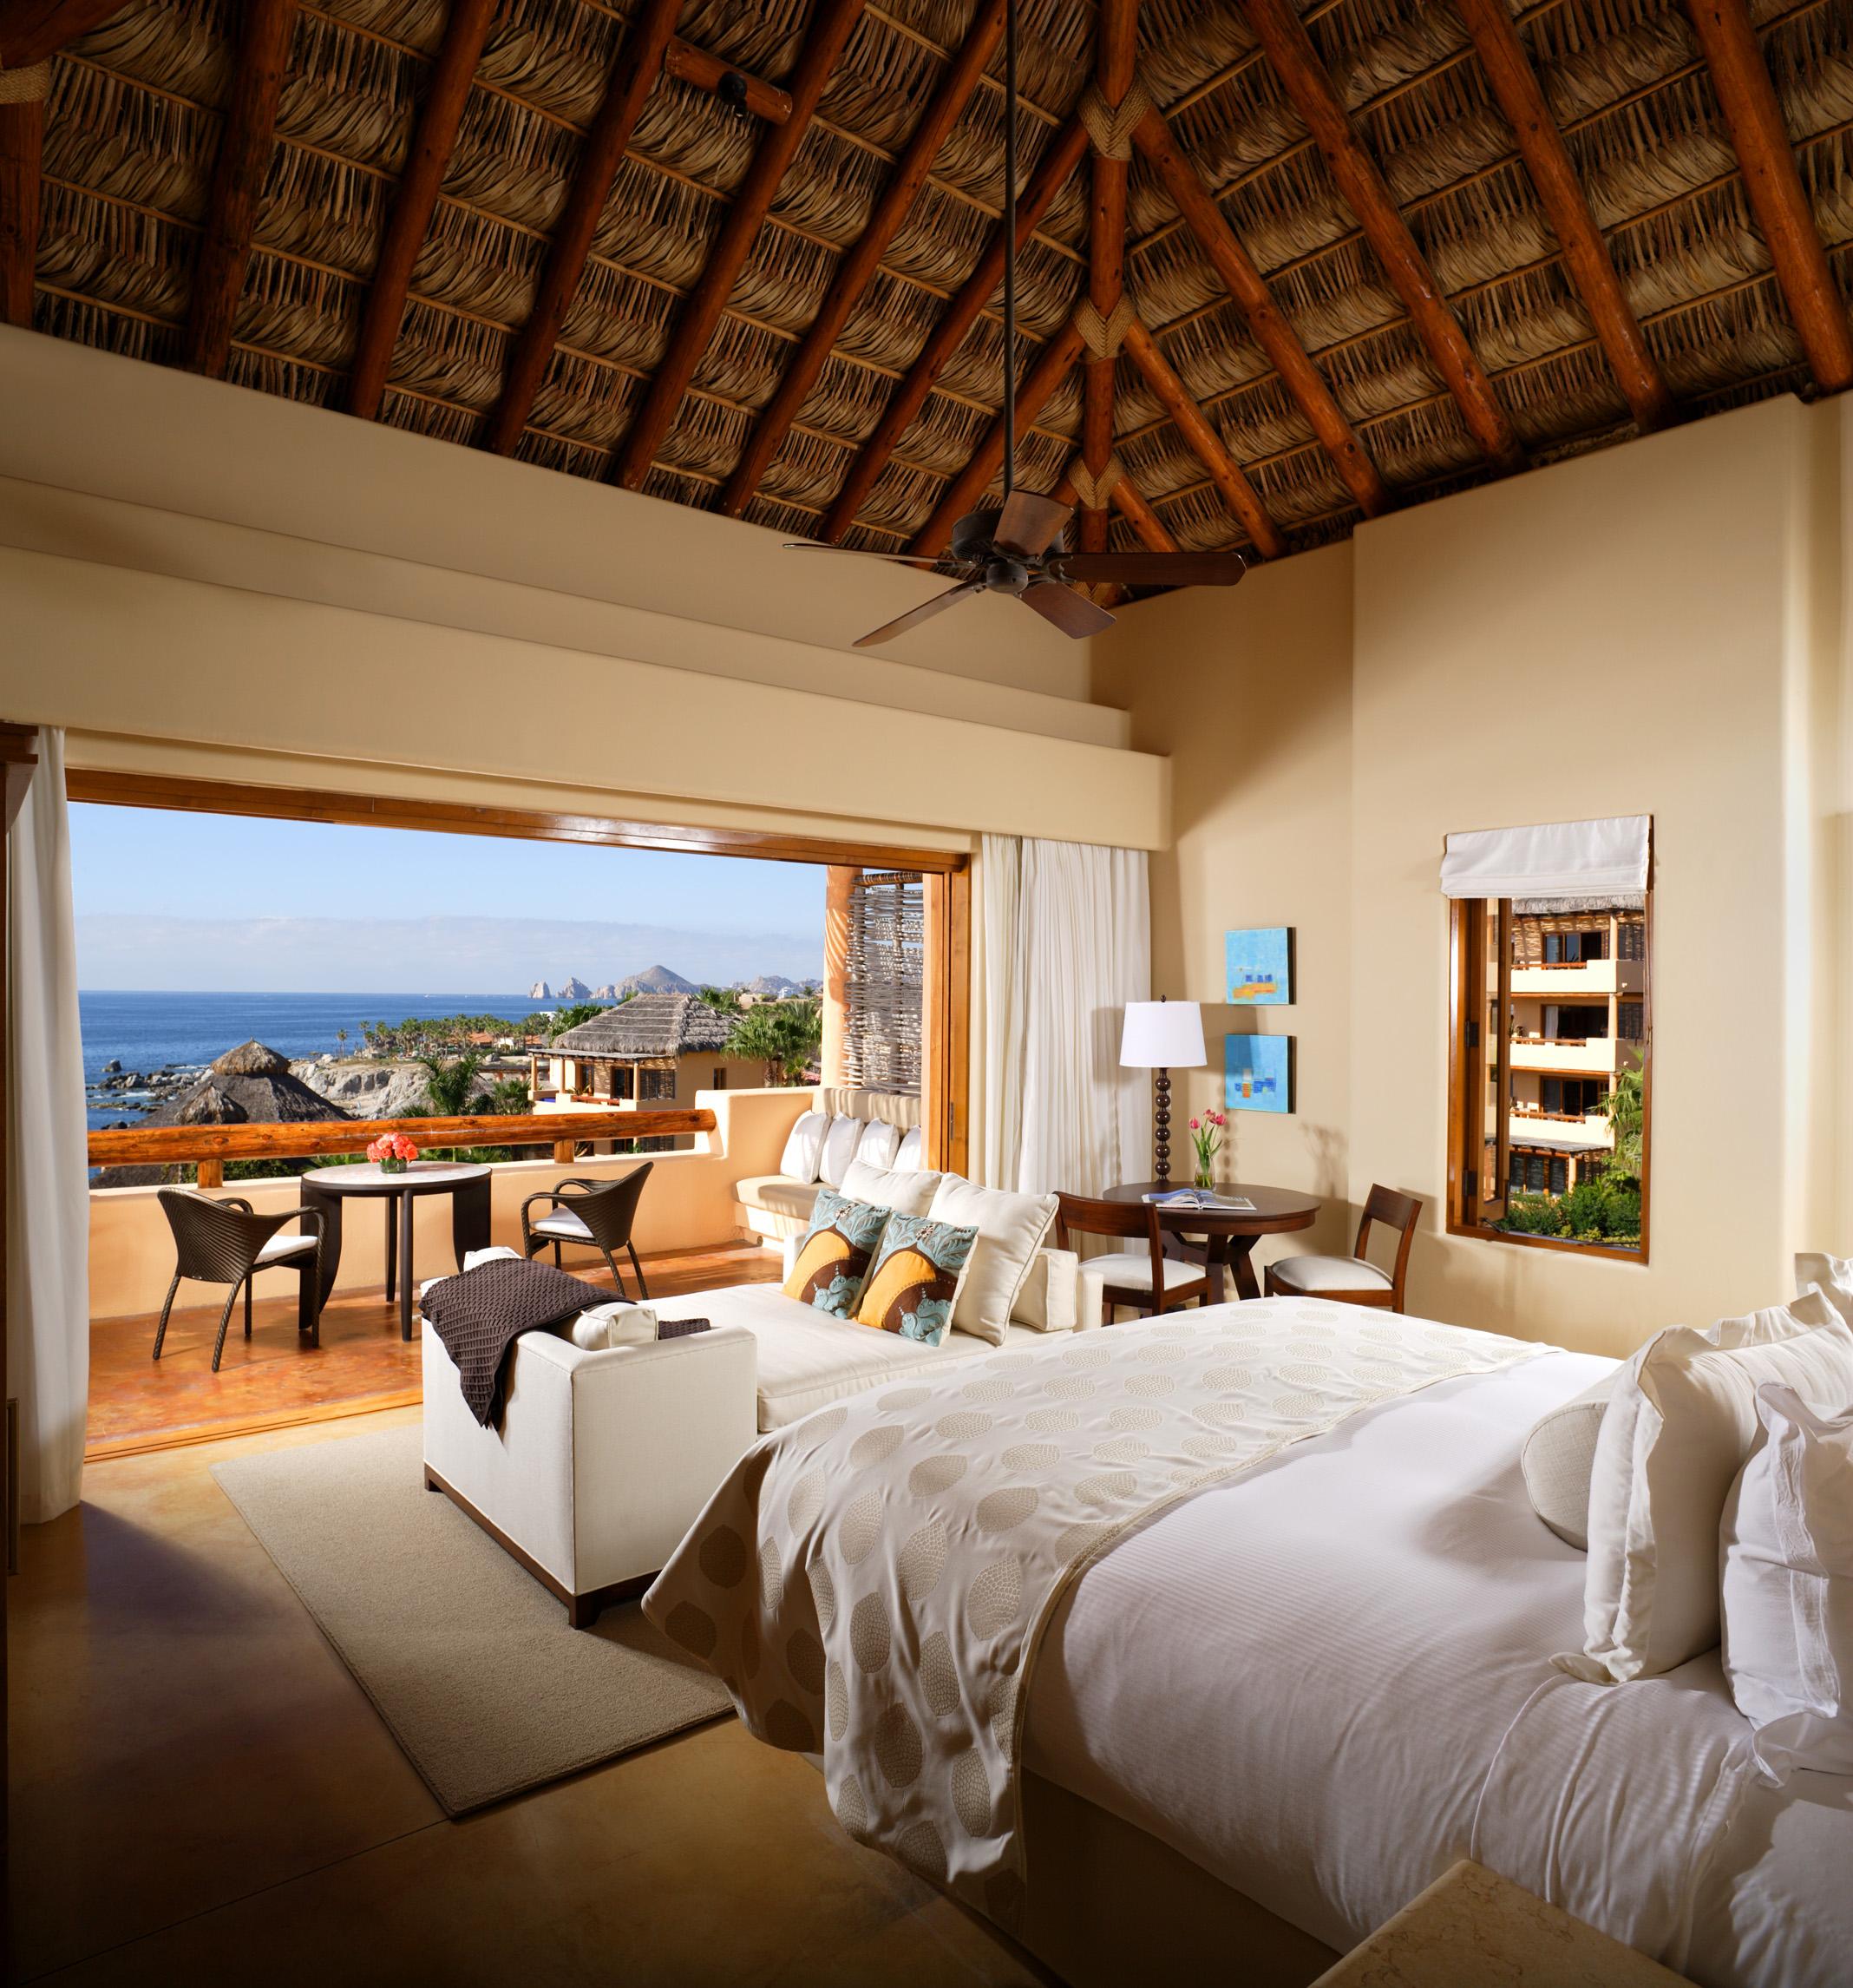 Luxury Resorts: Esperanza, An Auberge Resort Heats Up Its Meeting And